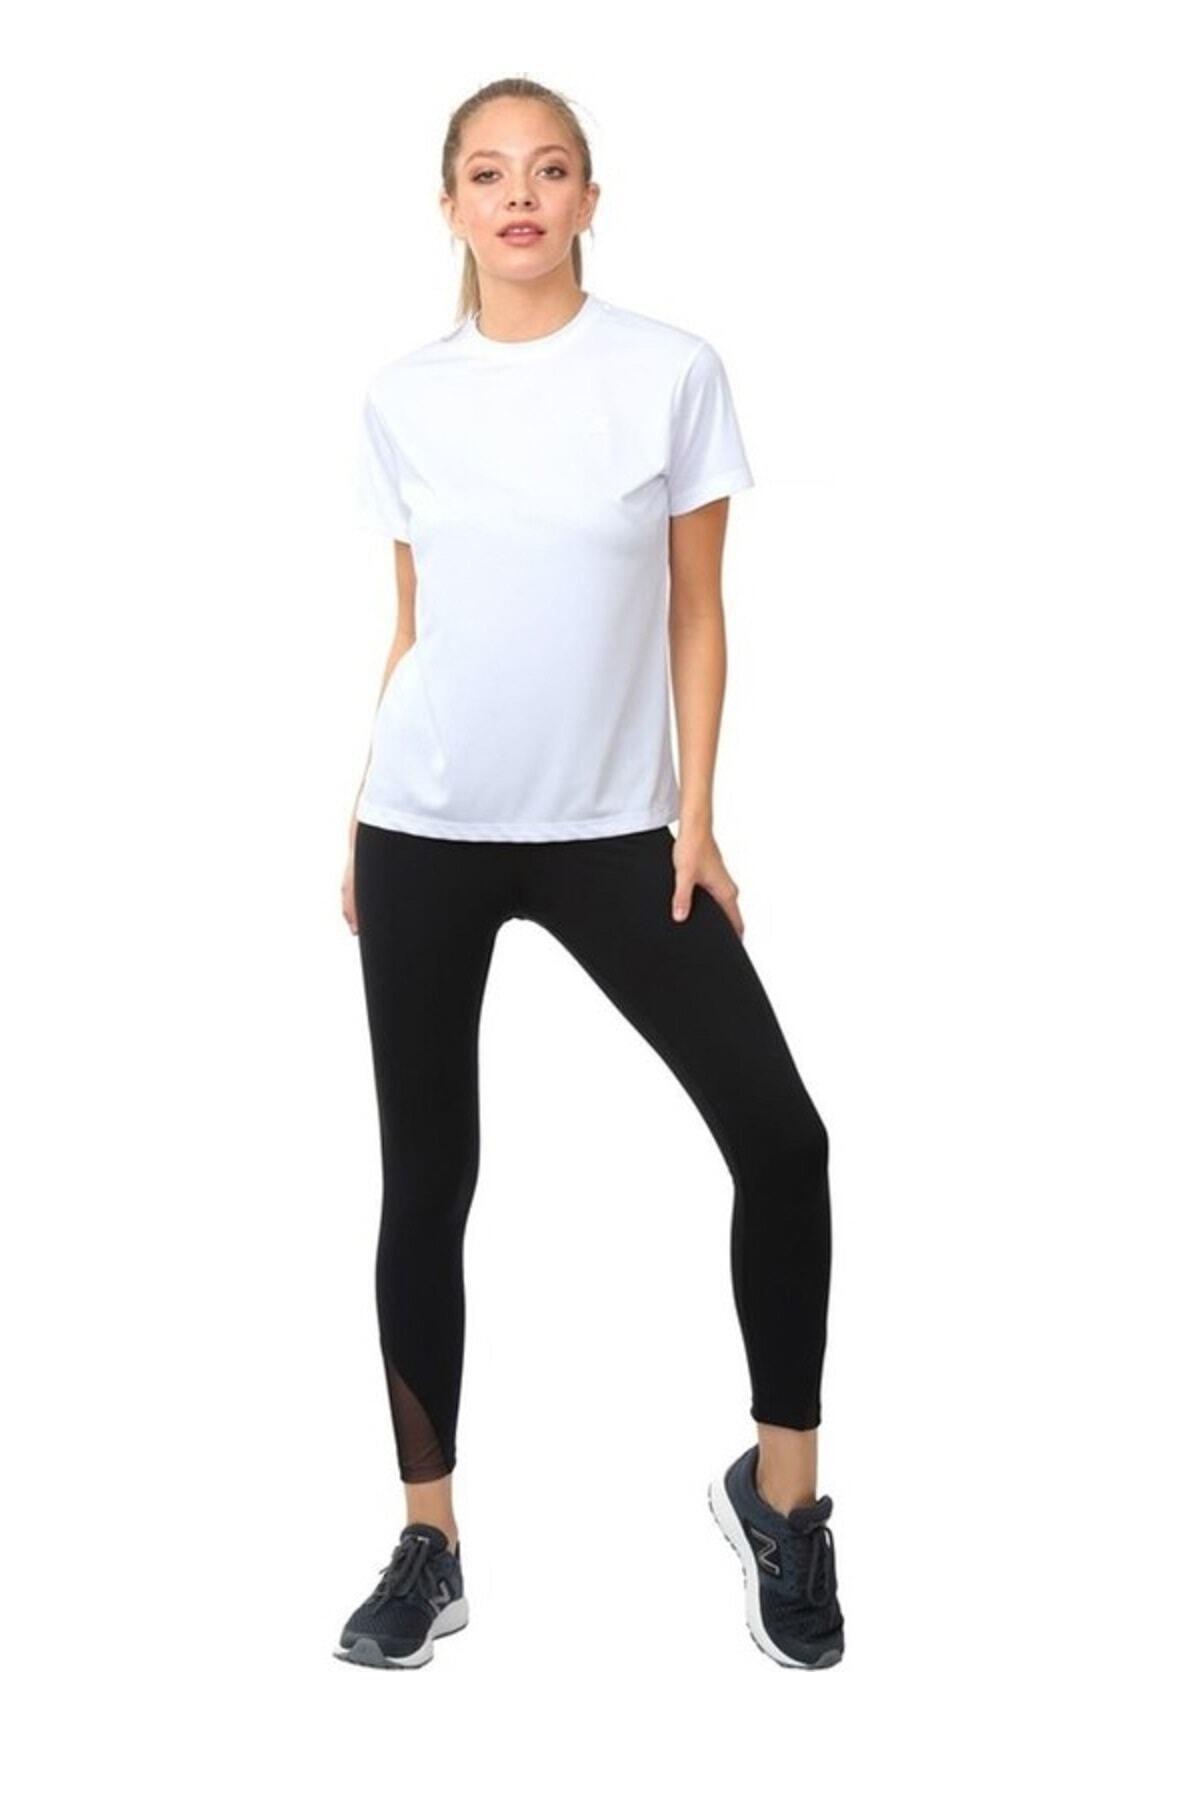 New Balance Kadın Spor T-shirt - Teamwear - Nbtm009-wt 1